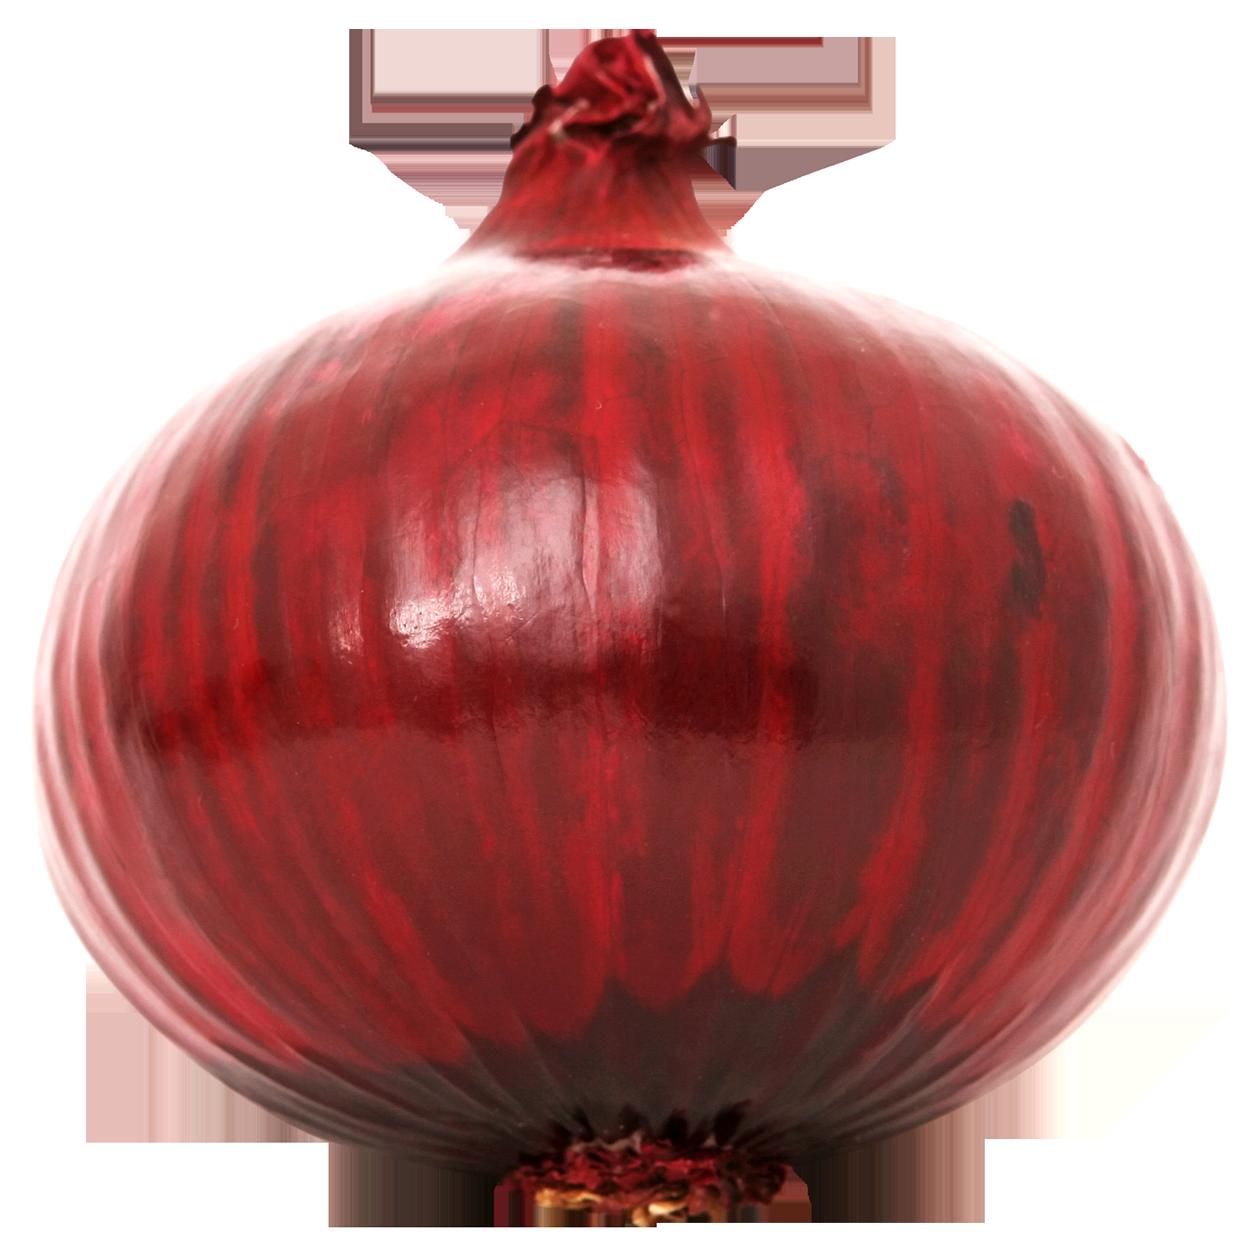 Png image pngpix red. Vegetables clipart bok choy